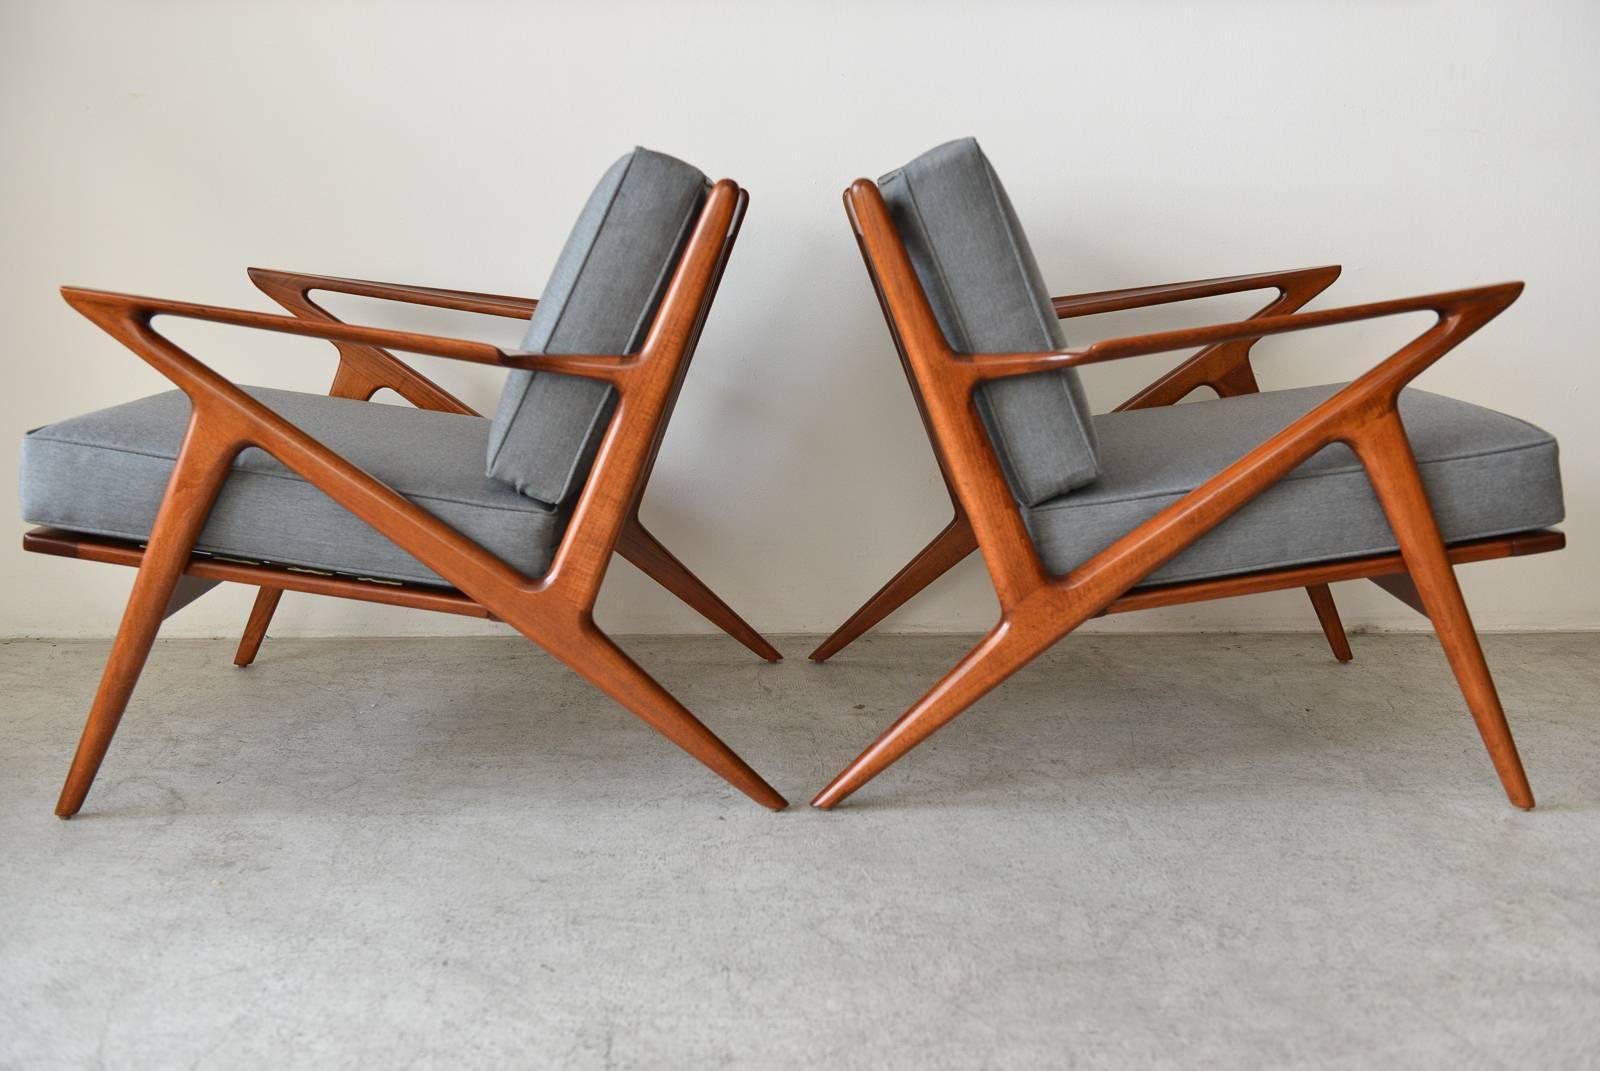 Pair Of Original Poul Jensen U0027Zu0027 Chairs By Selig, ...